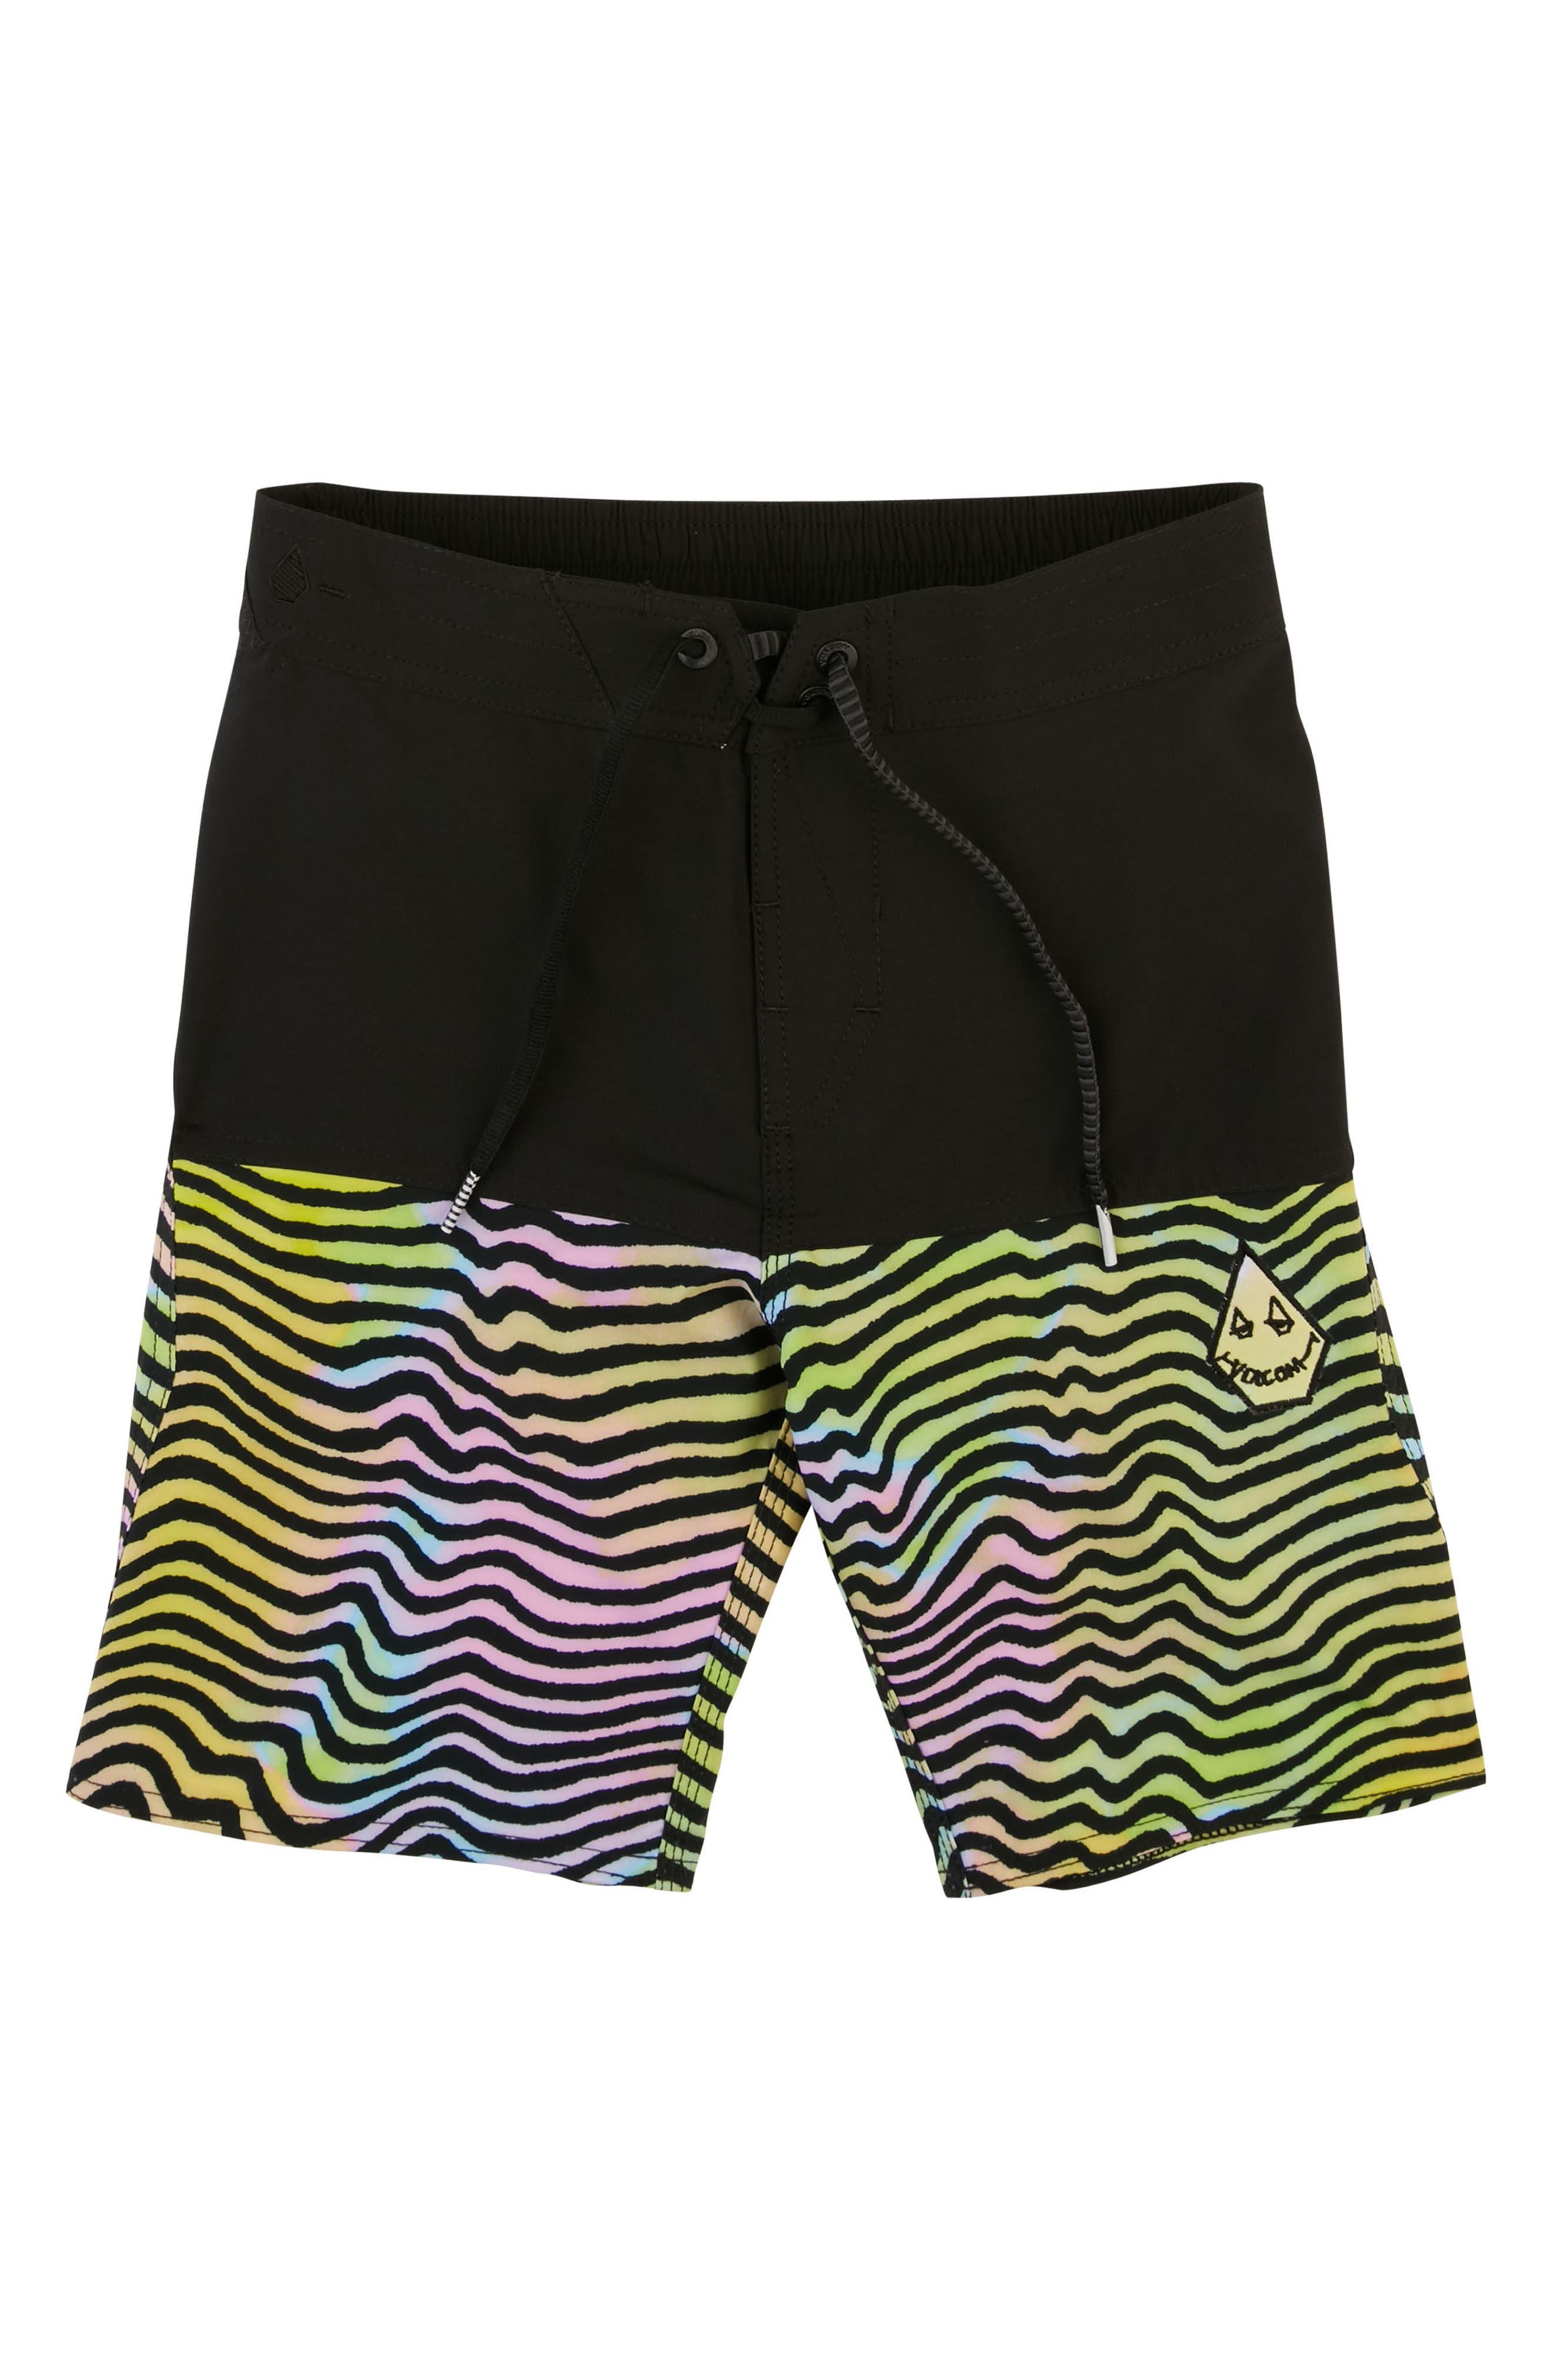 Vibes Board Shorts,                         Main,                         color, MULTI